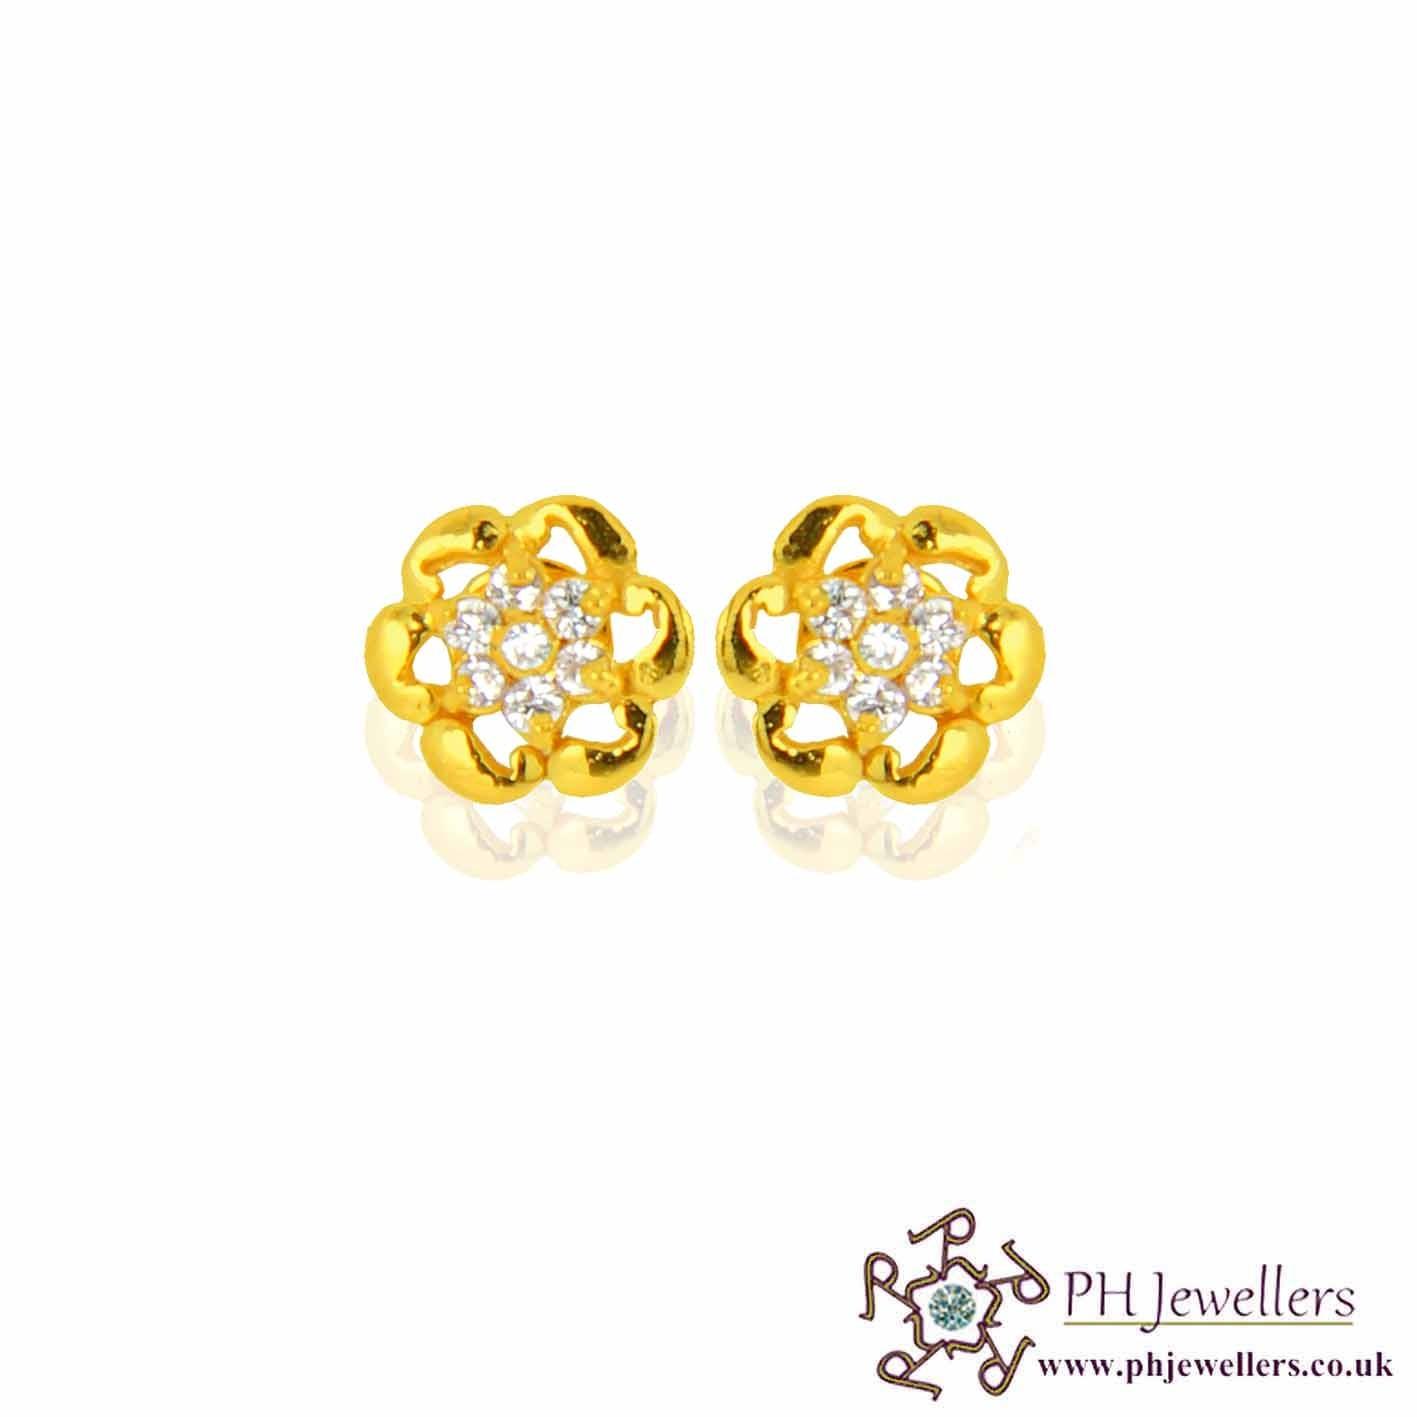 22ct 916 Yellow Gold Earring CZ SE49